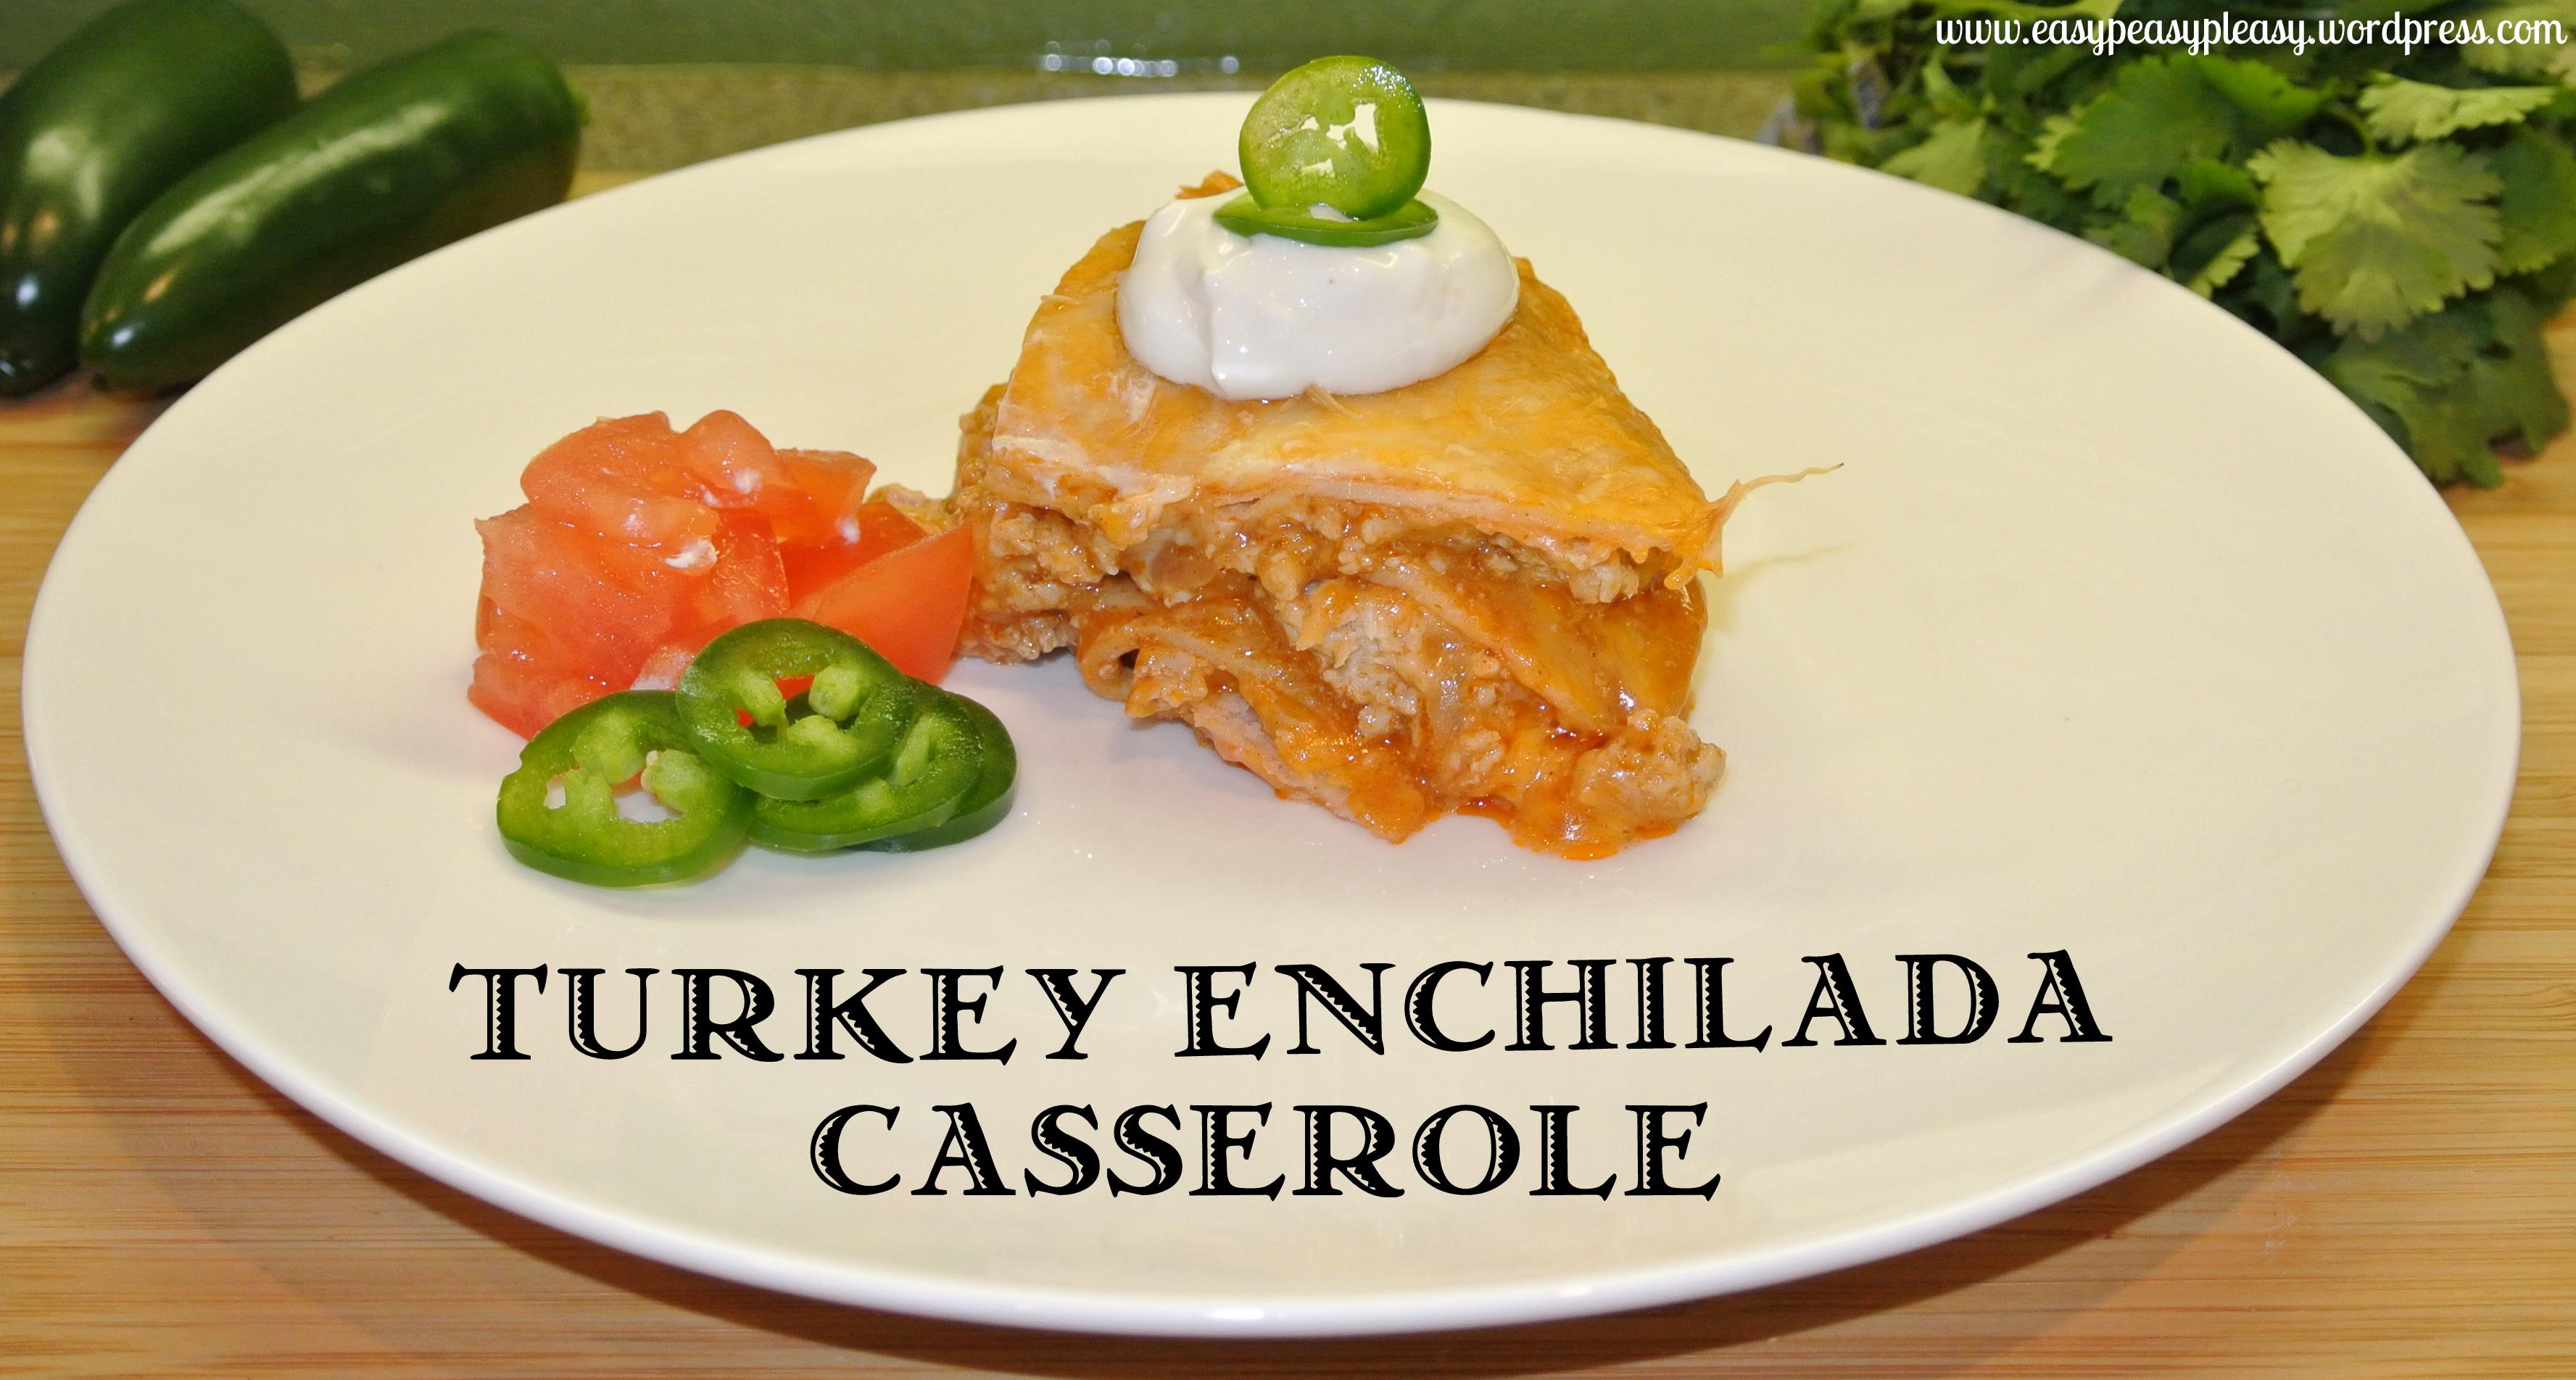 Turkey Enchilada Casserole A little slice of the pie